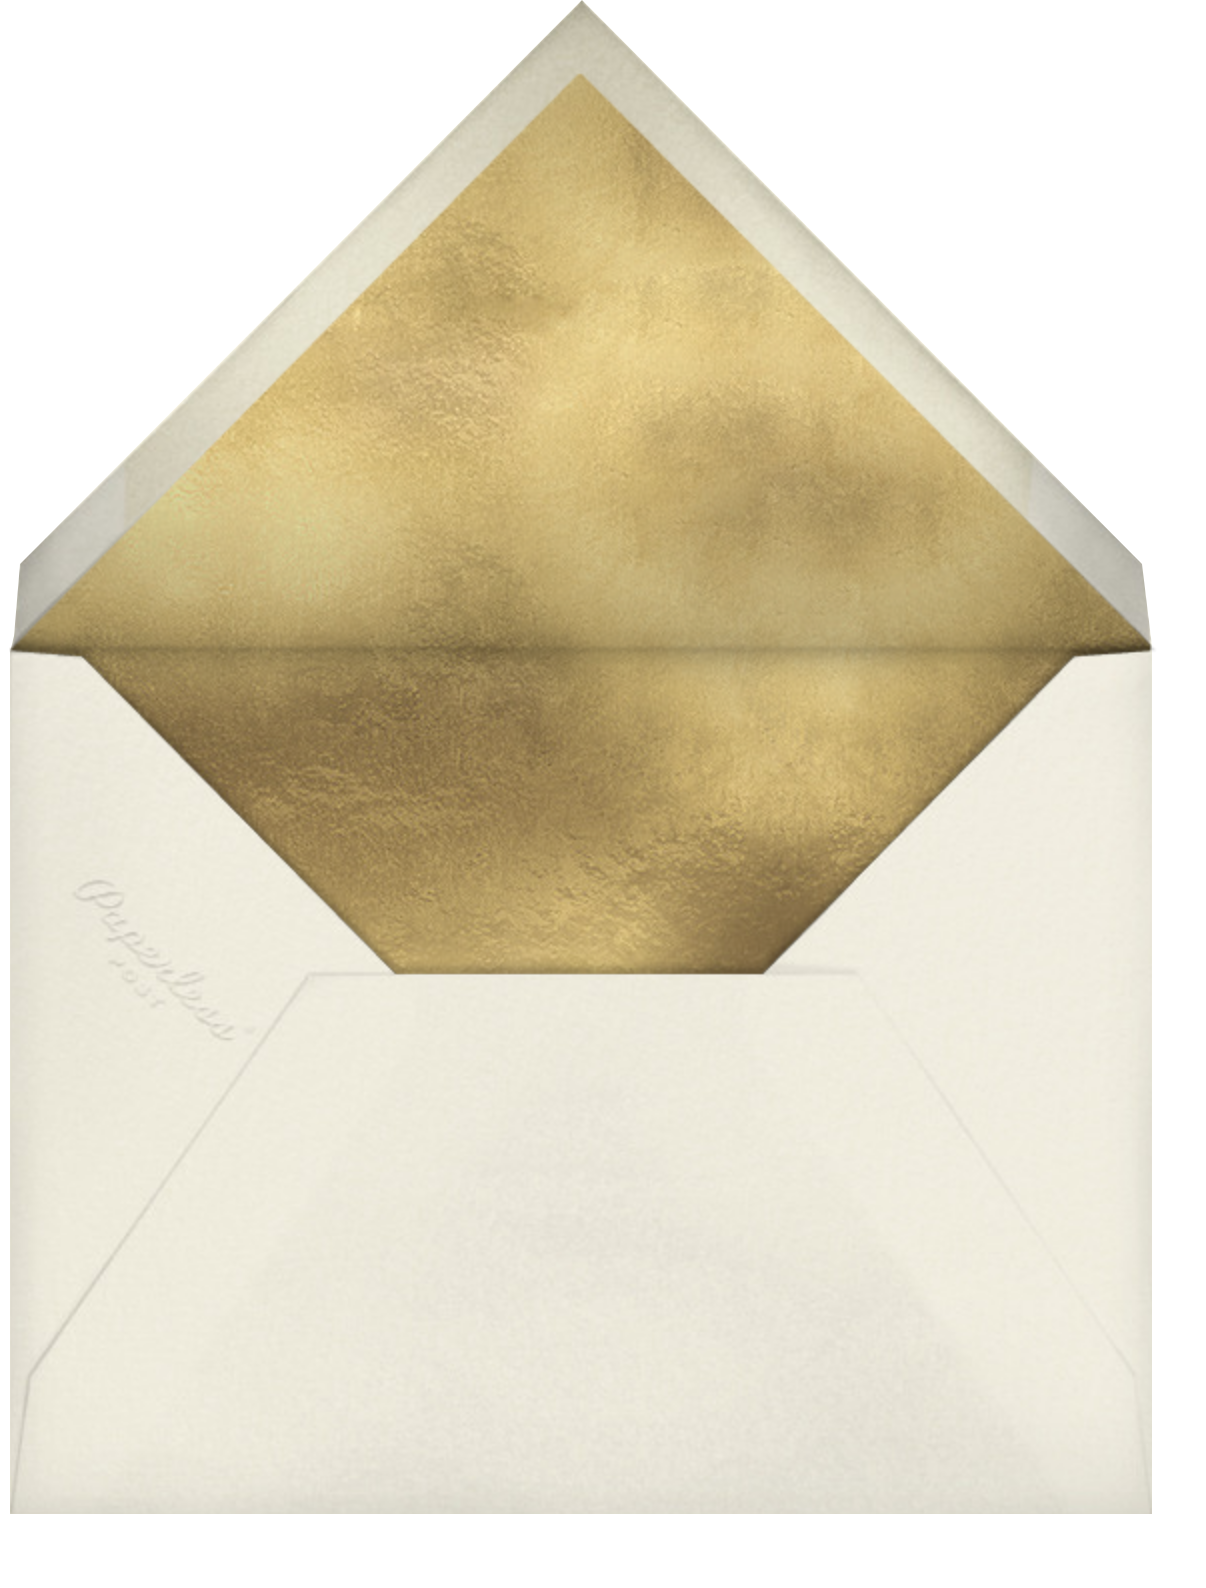 Joyful Eid (Invitation) - Cream - Paperless Post - Ramadan - envelope back